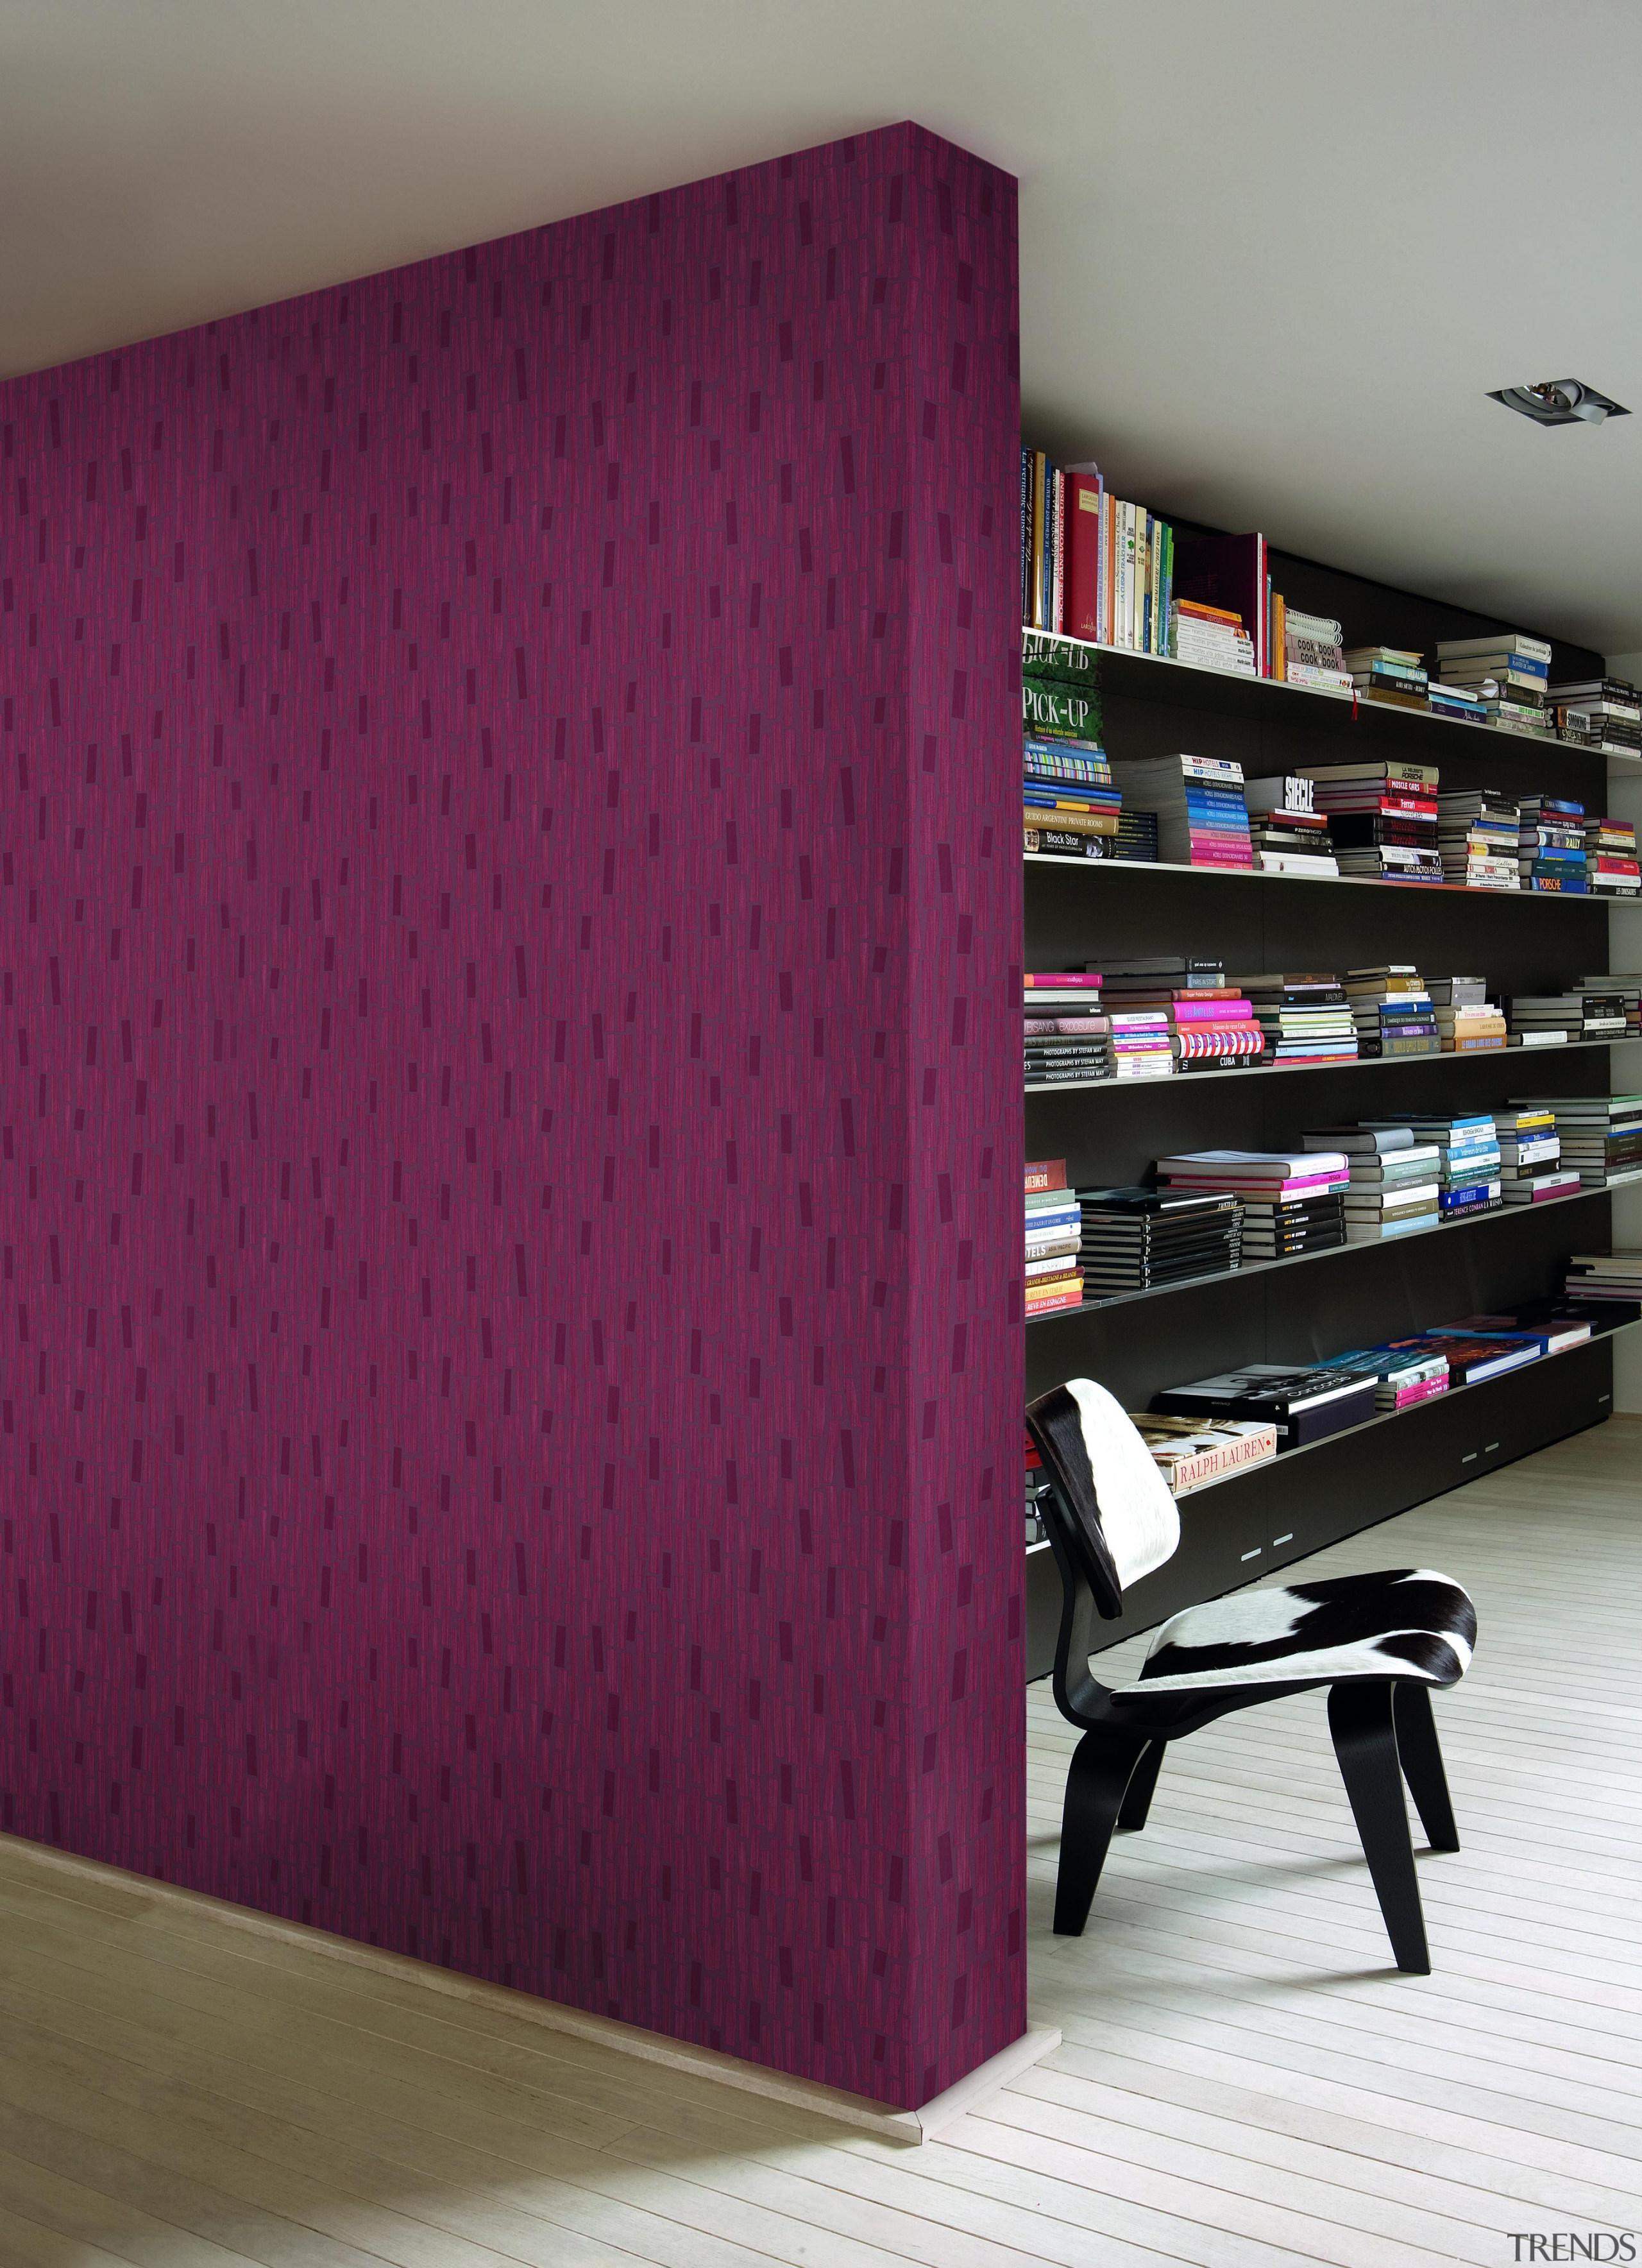 Modern Style Range - Modern Style Range - floor, flooring, furniture, interior design, product, purple, shelf, shelving, wall, purple